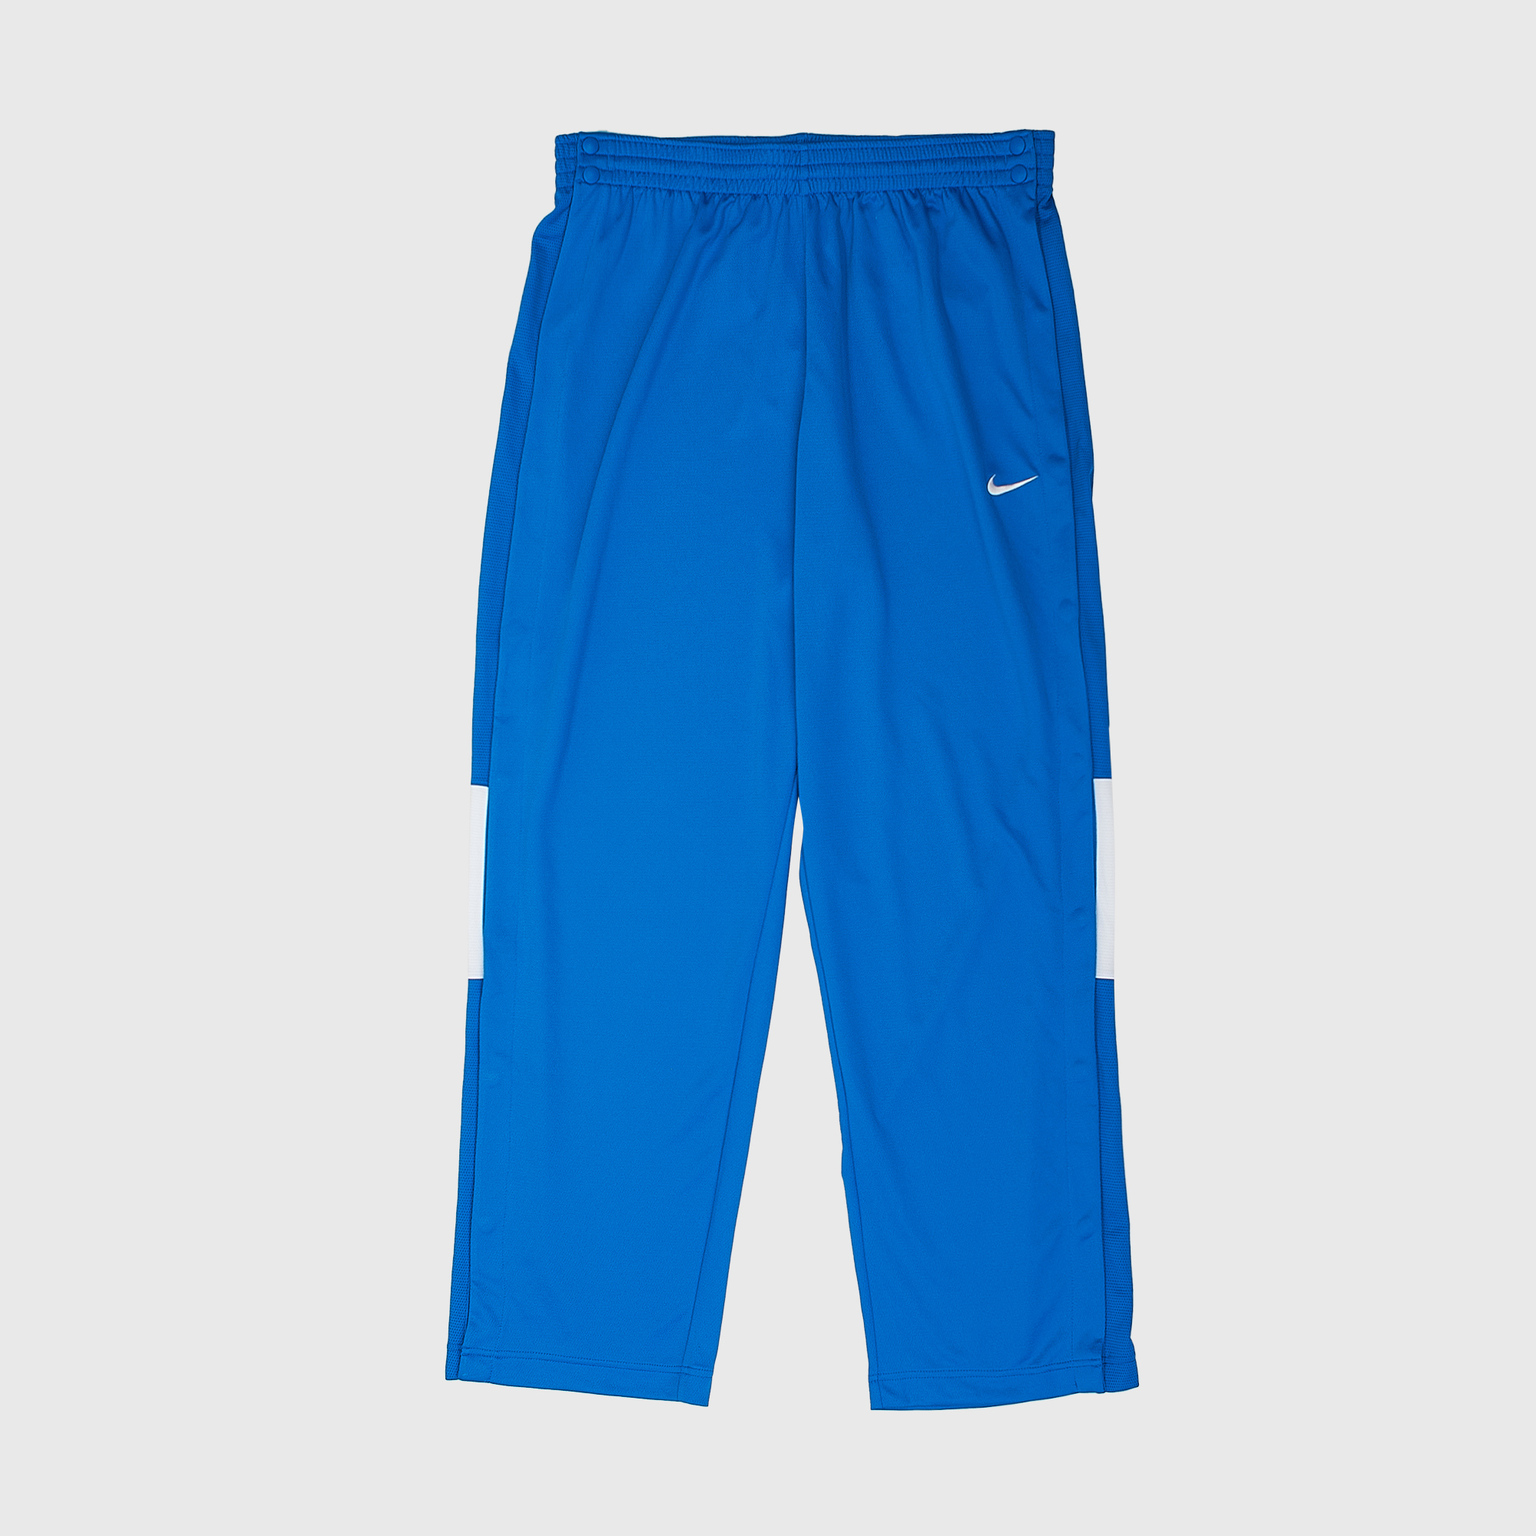 Брюки тренировочные Nike Rivalry Tear Awey Pant 802331-494 цена и фото